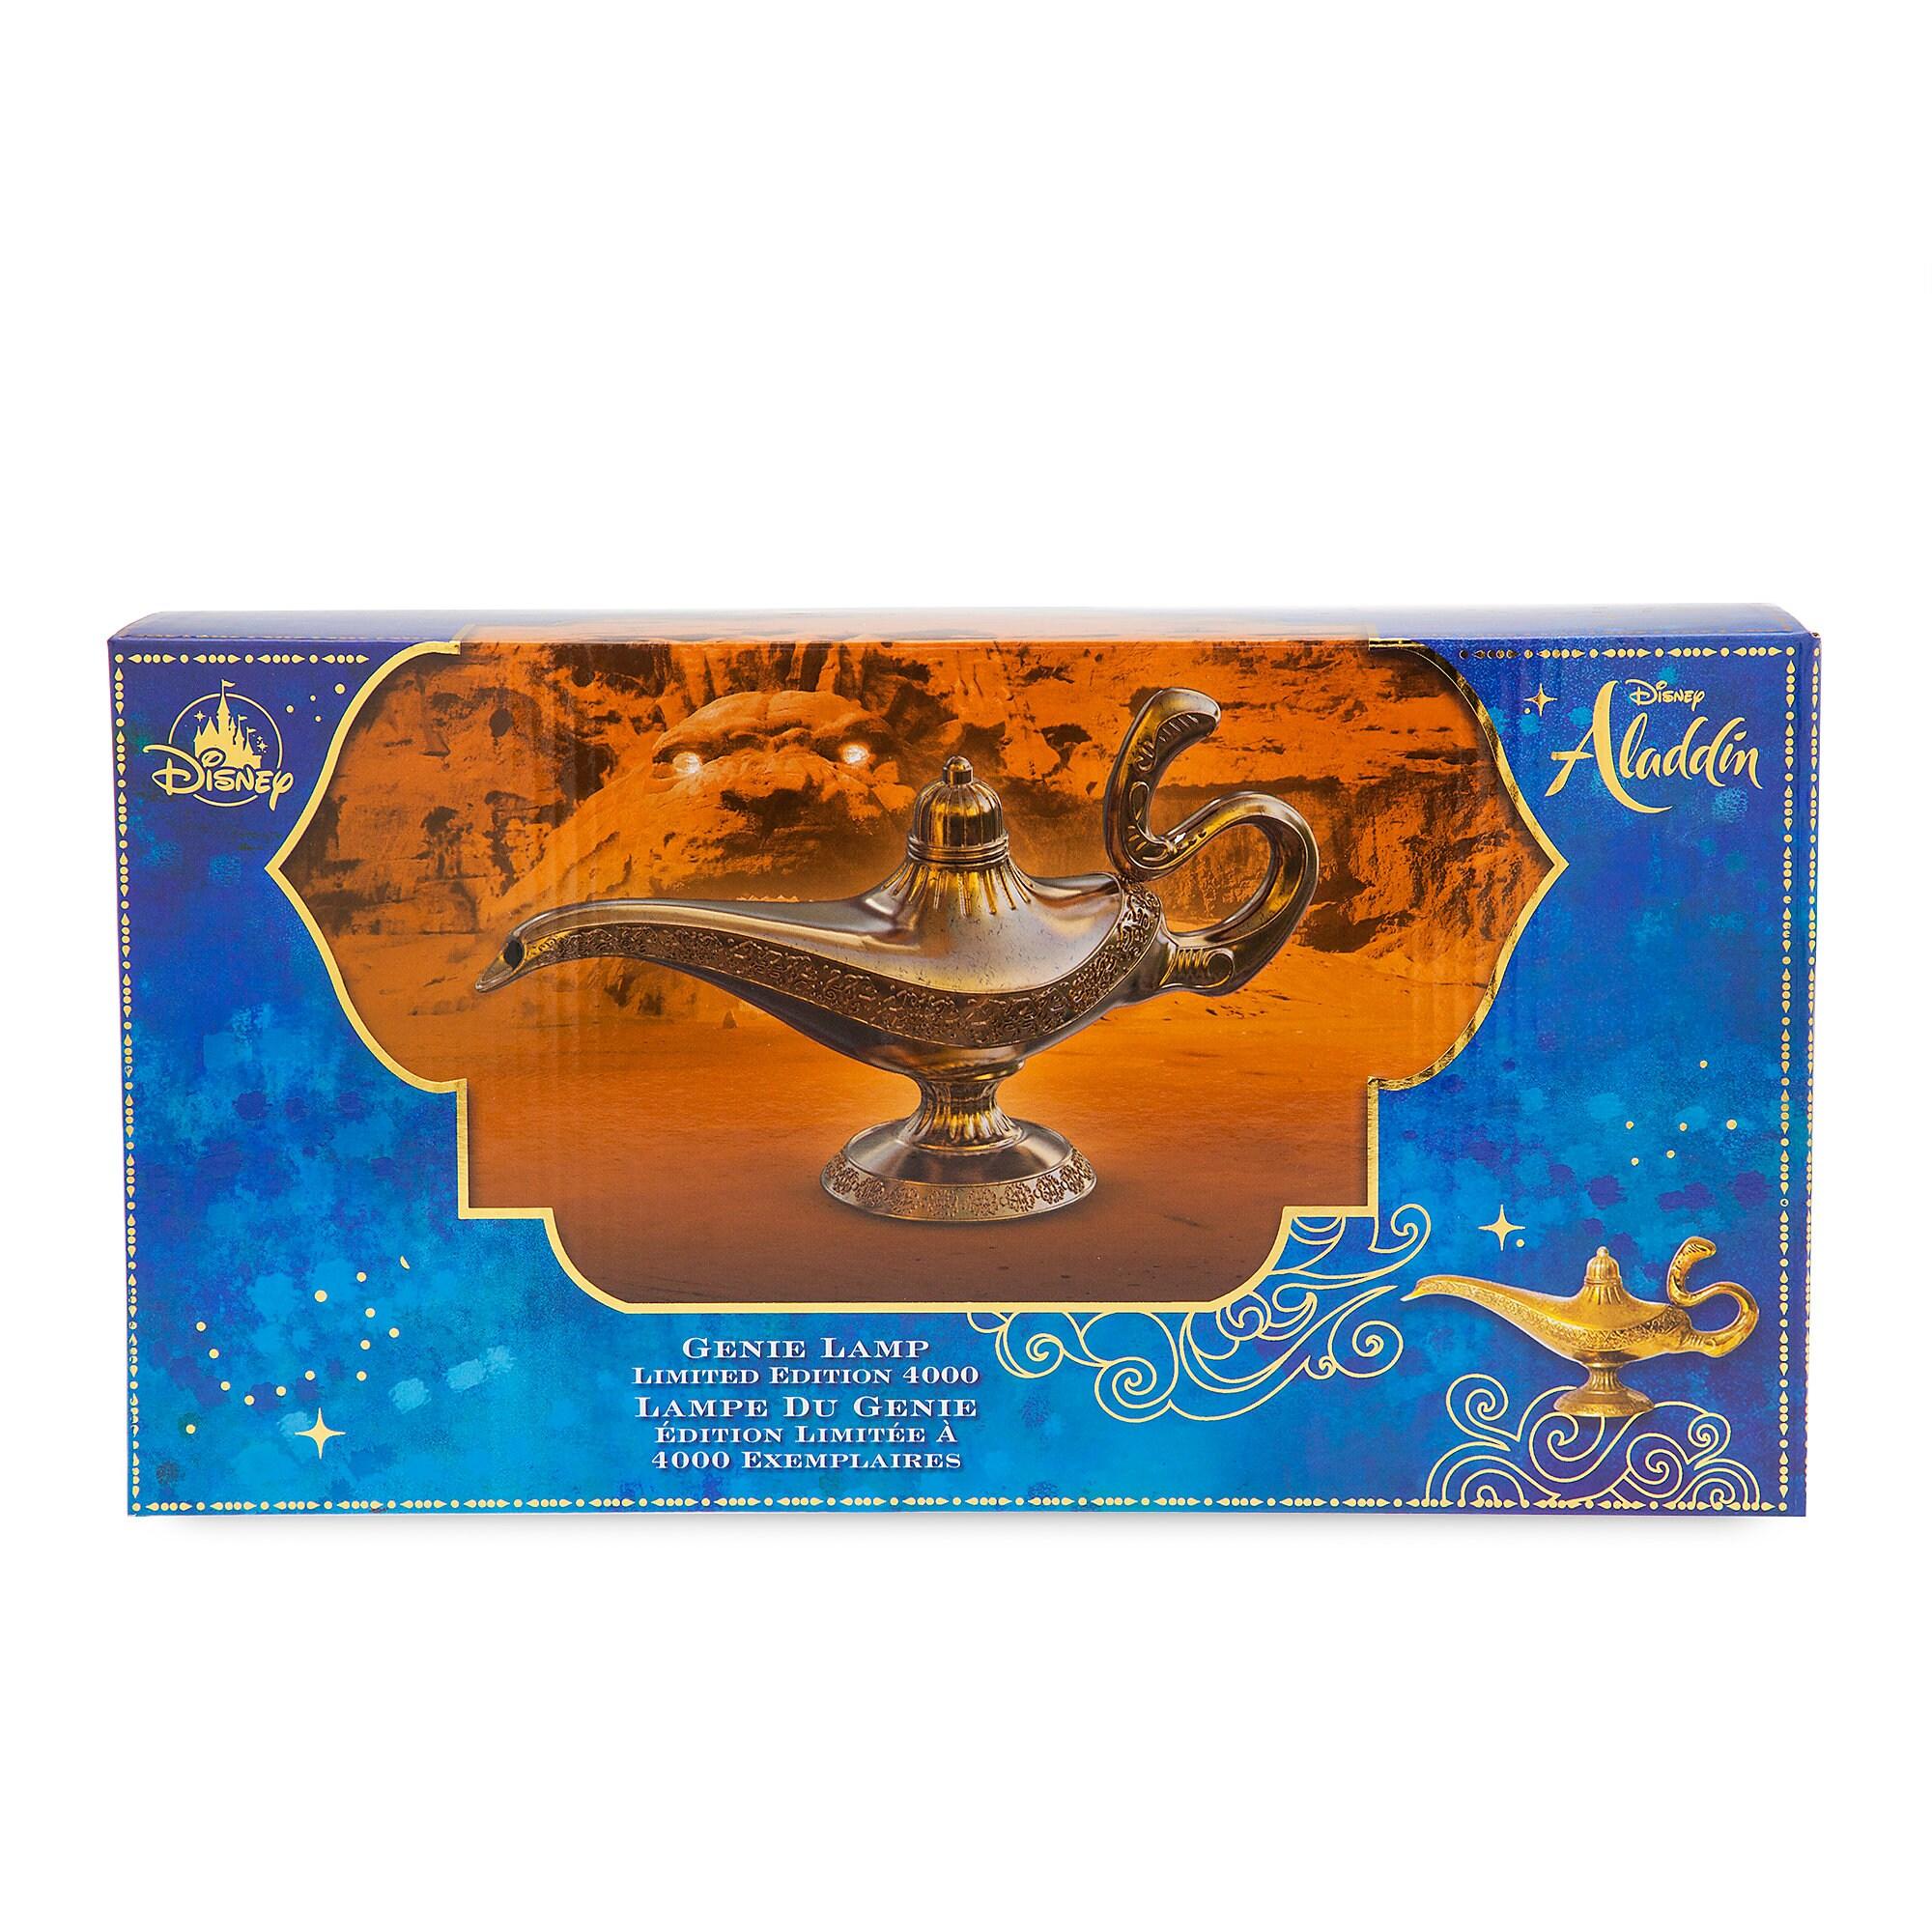 Genie Lamp Replica - Aladdin - Live Action Film - Limited Edition